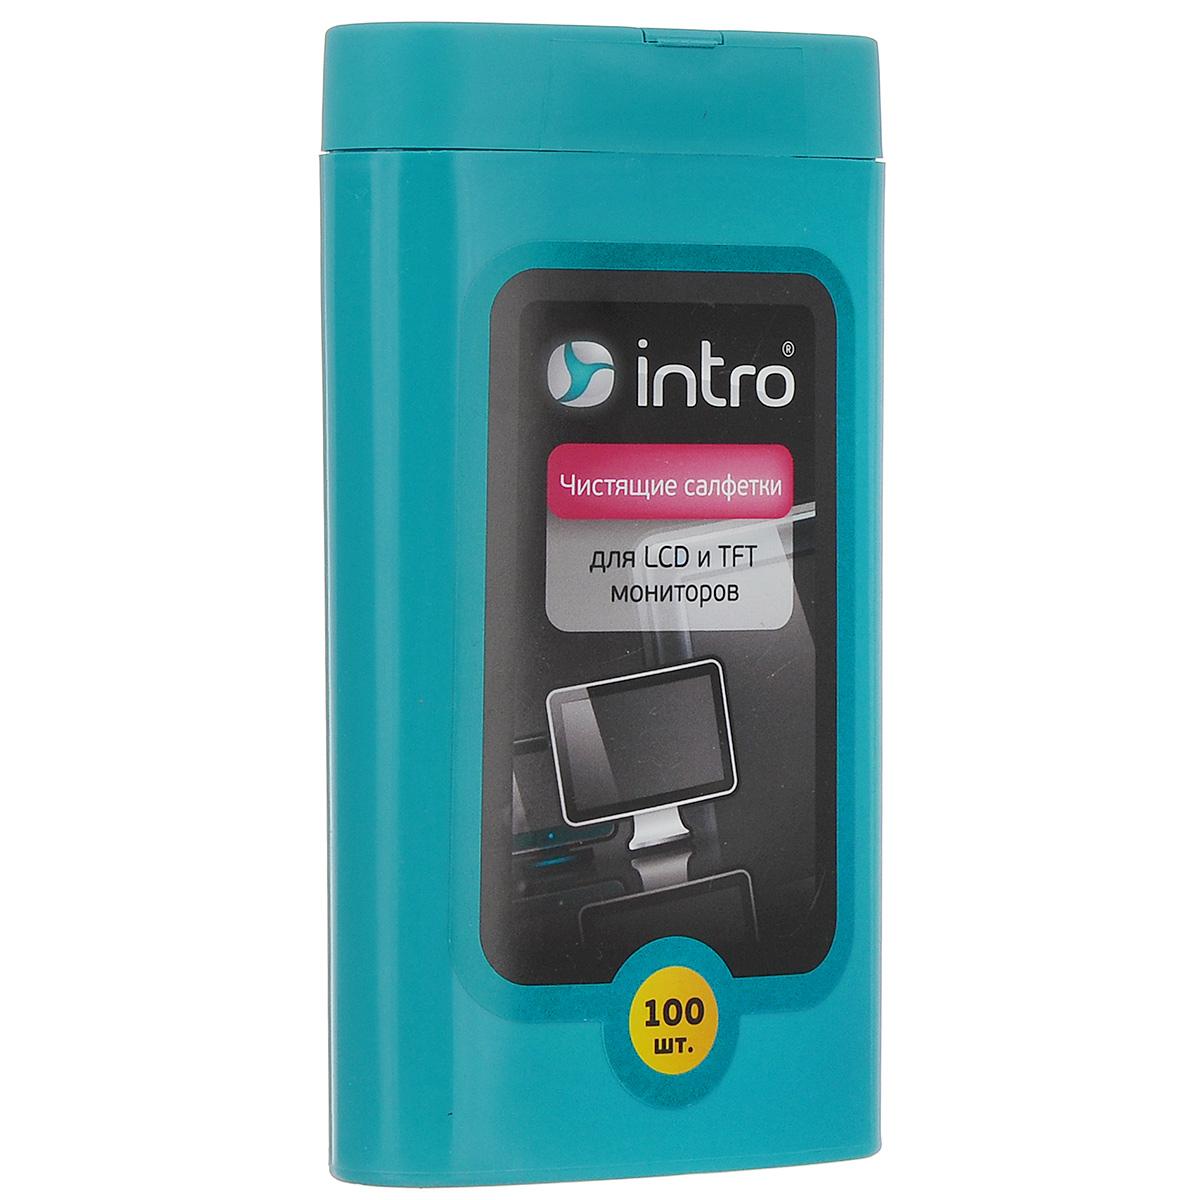 Чистящие салфетки для LCD и TFT мониторов Intro, 100 шт 2 8 inch tft lcd display digital peephole door viewer camera